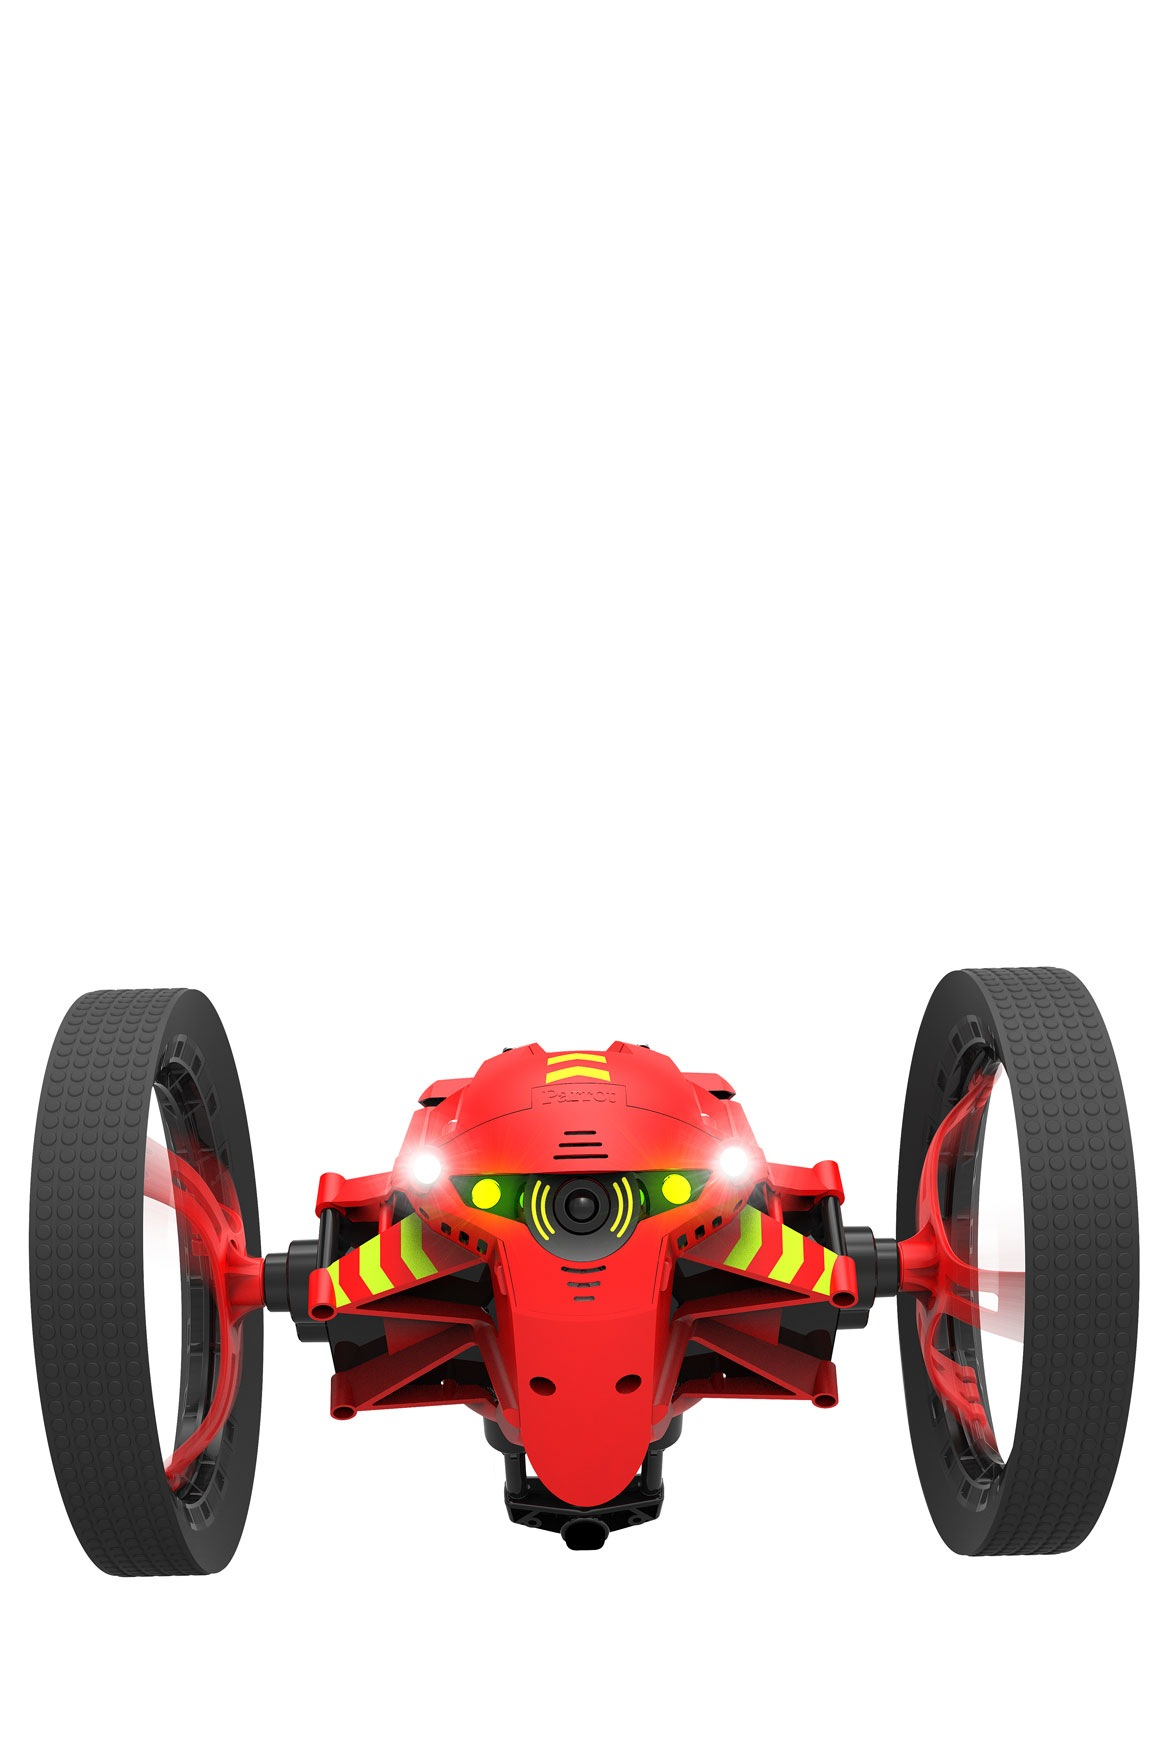 Parrot Minidrone Jumping Night Marshall Red Myer Online Minidrones Hydrofoil Drone Orak